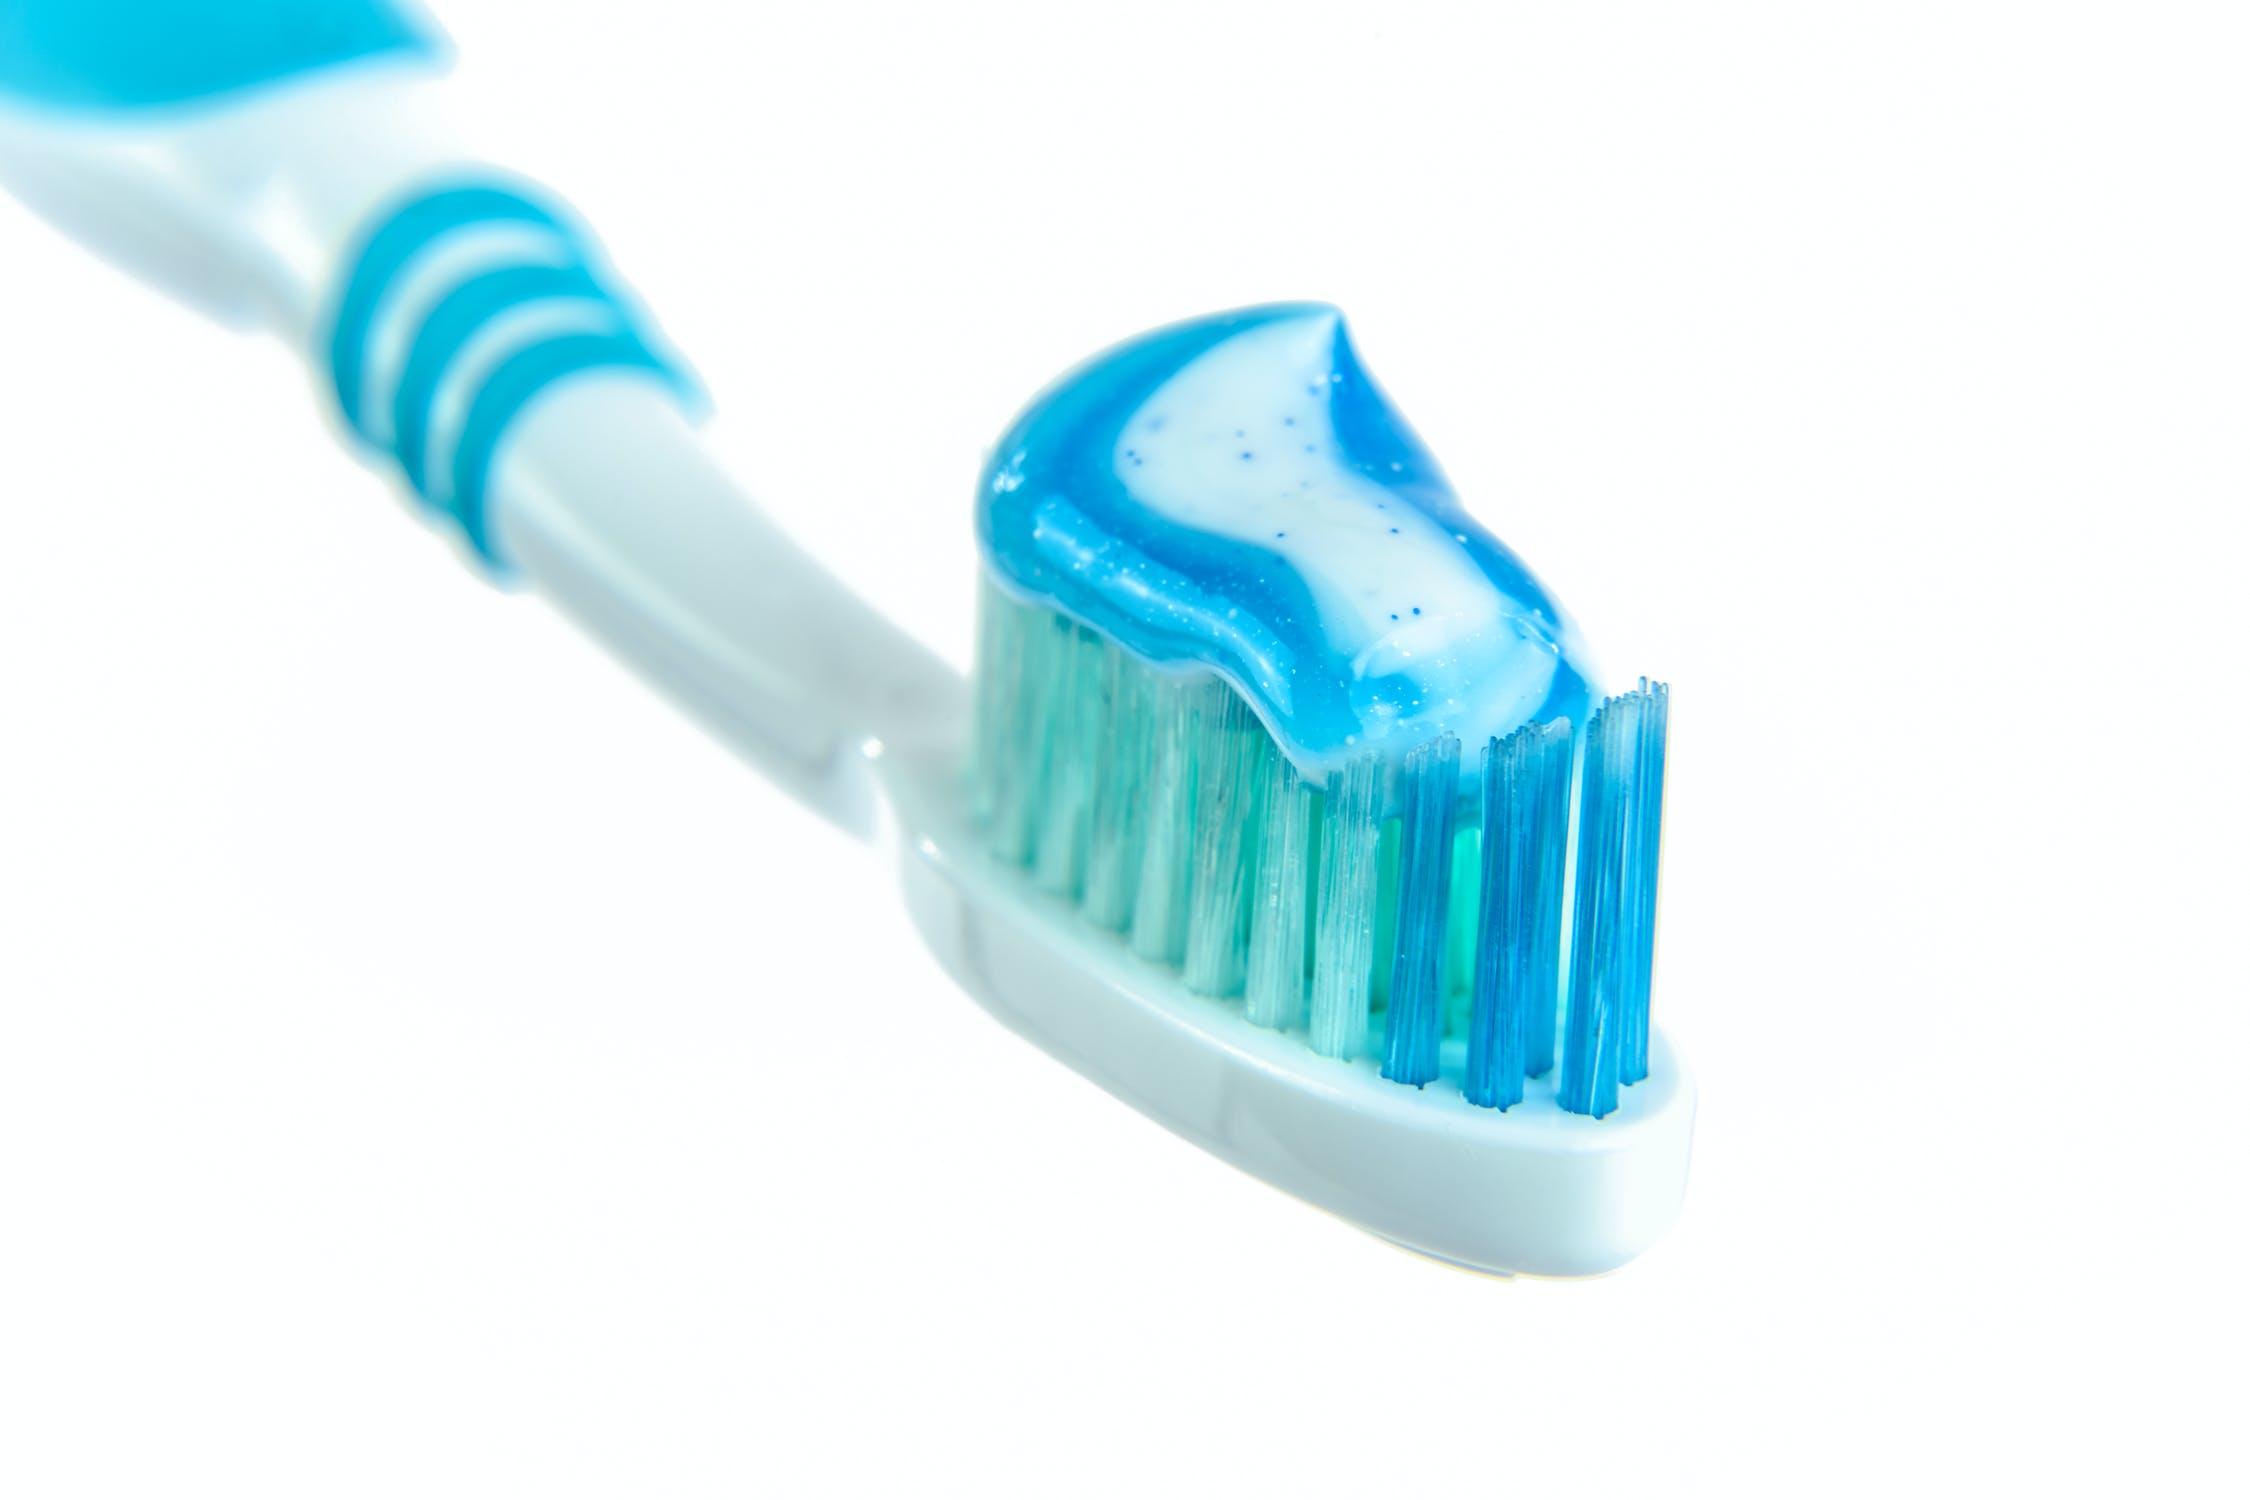 Side Effects Using Tooth Paste-ఈ విషయాలు తెలిస్తే టూత్ పేస్ట్ అసలు వాడరు..-General-Telugu-Telugu Tollywood Photo Image-TeluguStop.com